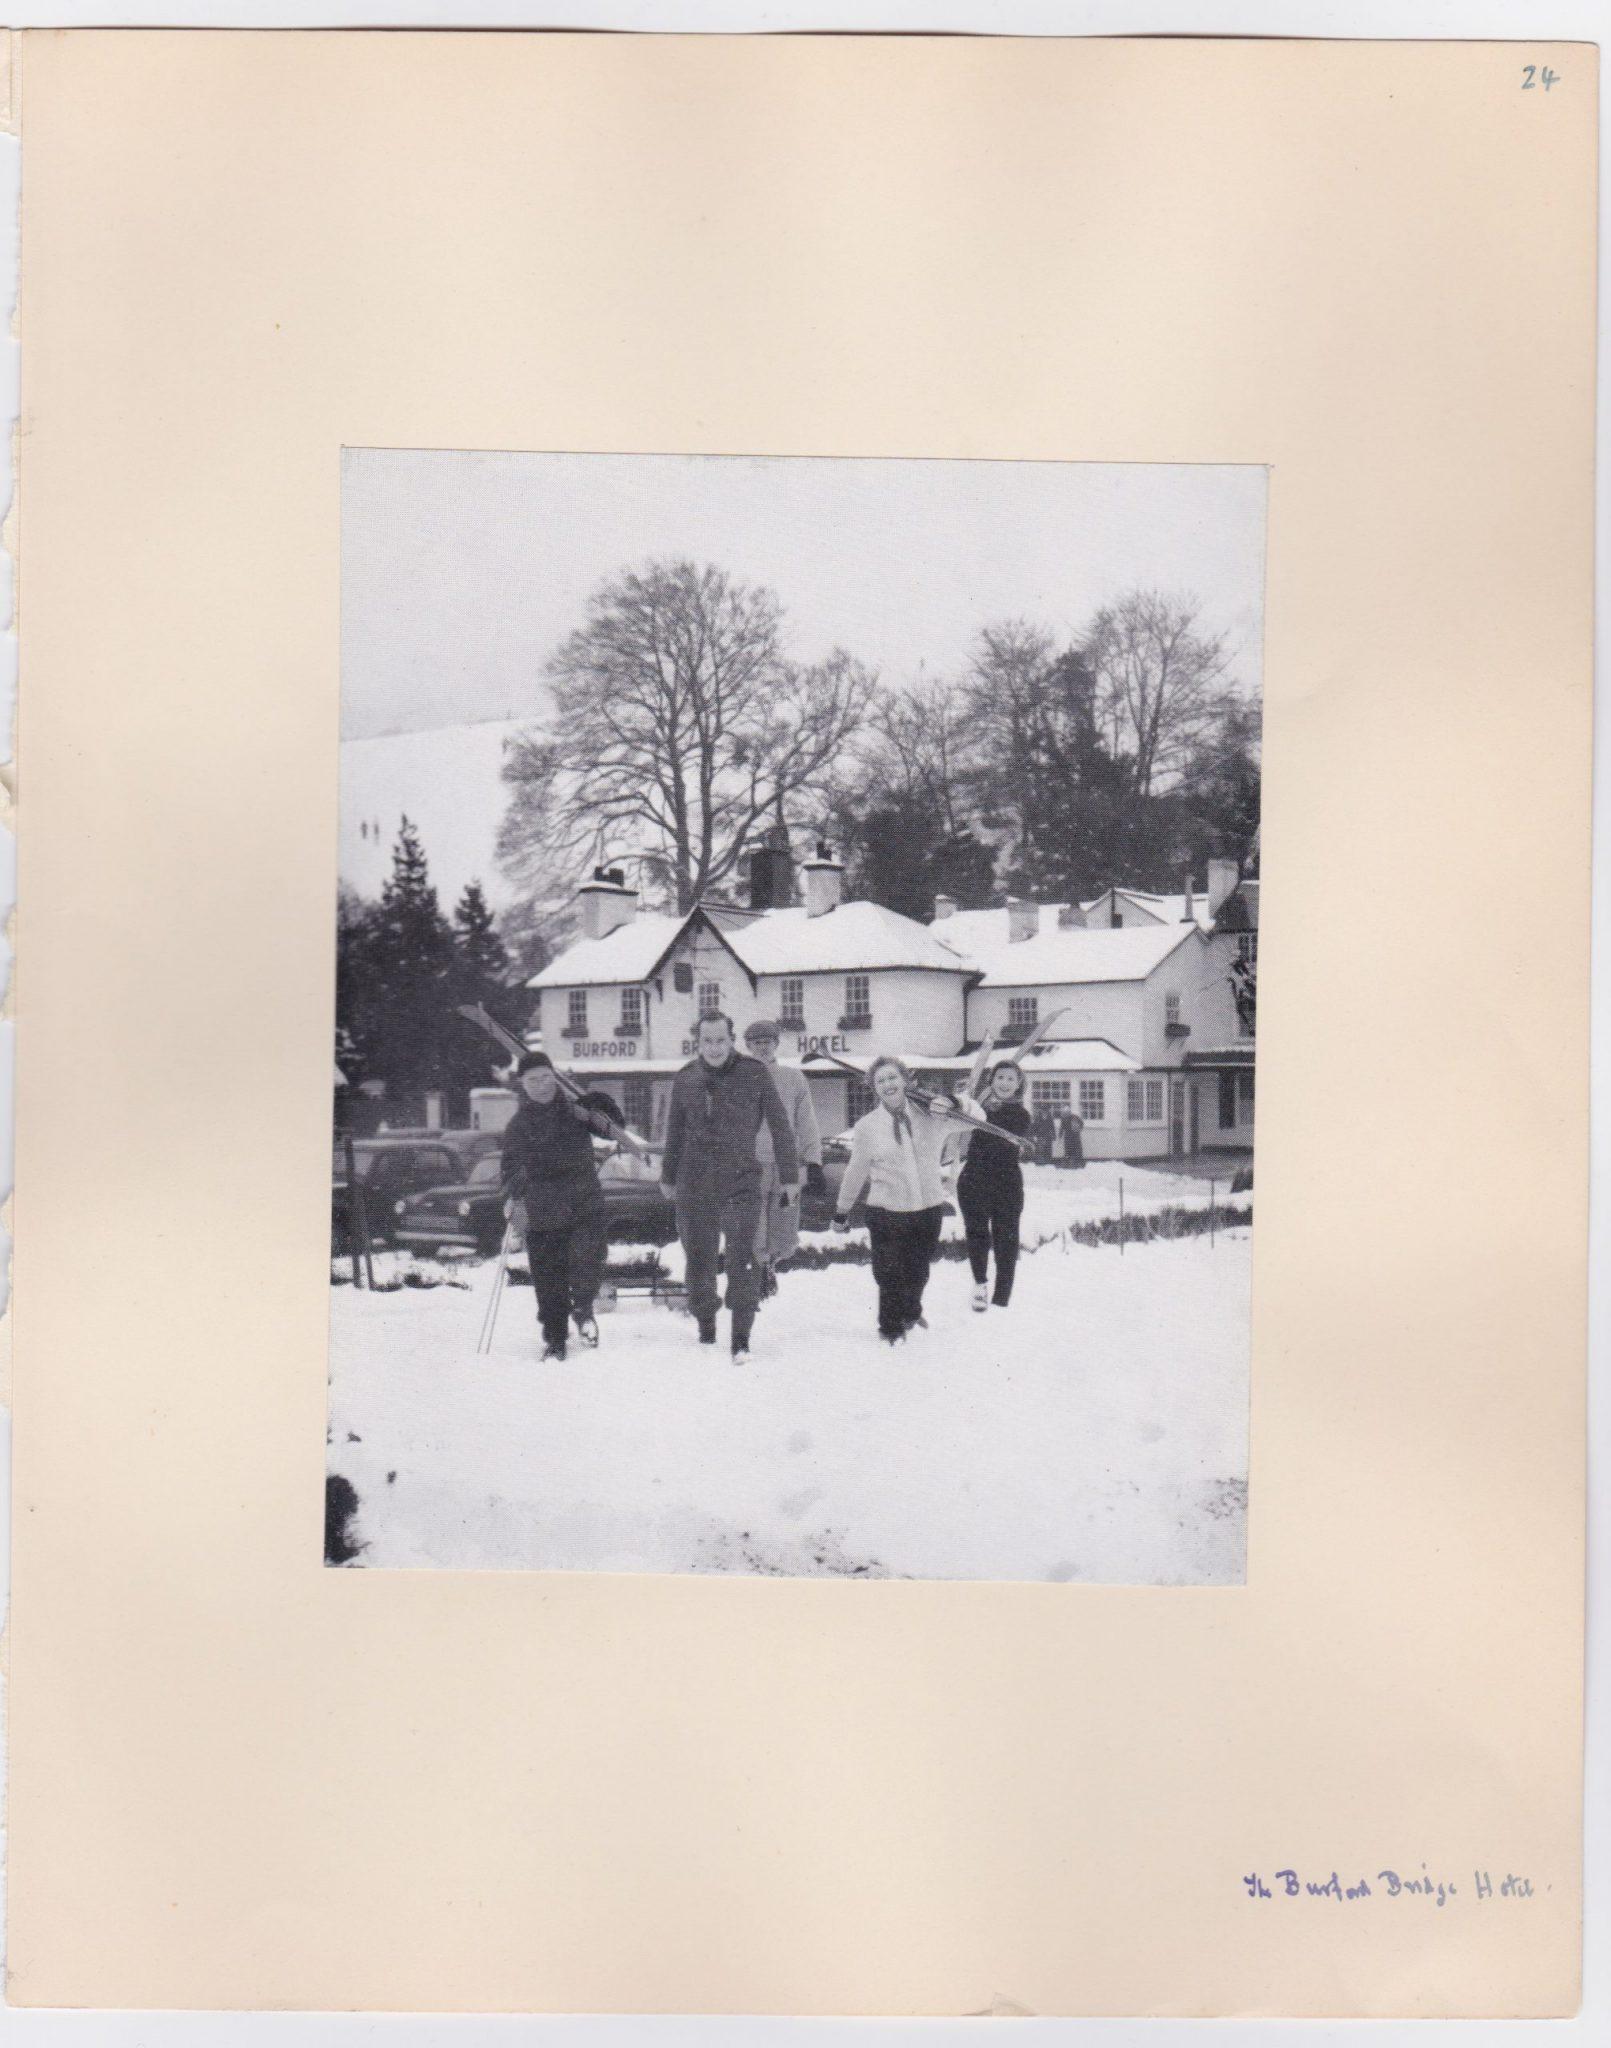 The Burford Bridge Hotel snowed in circa 1956